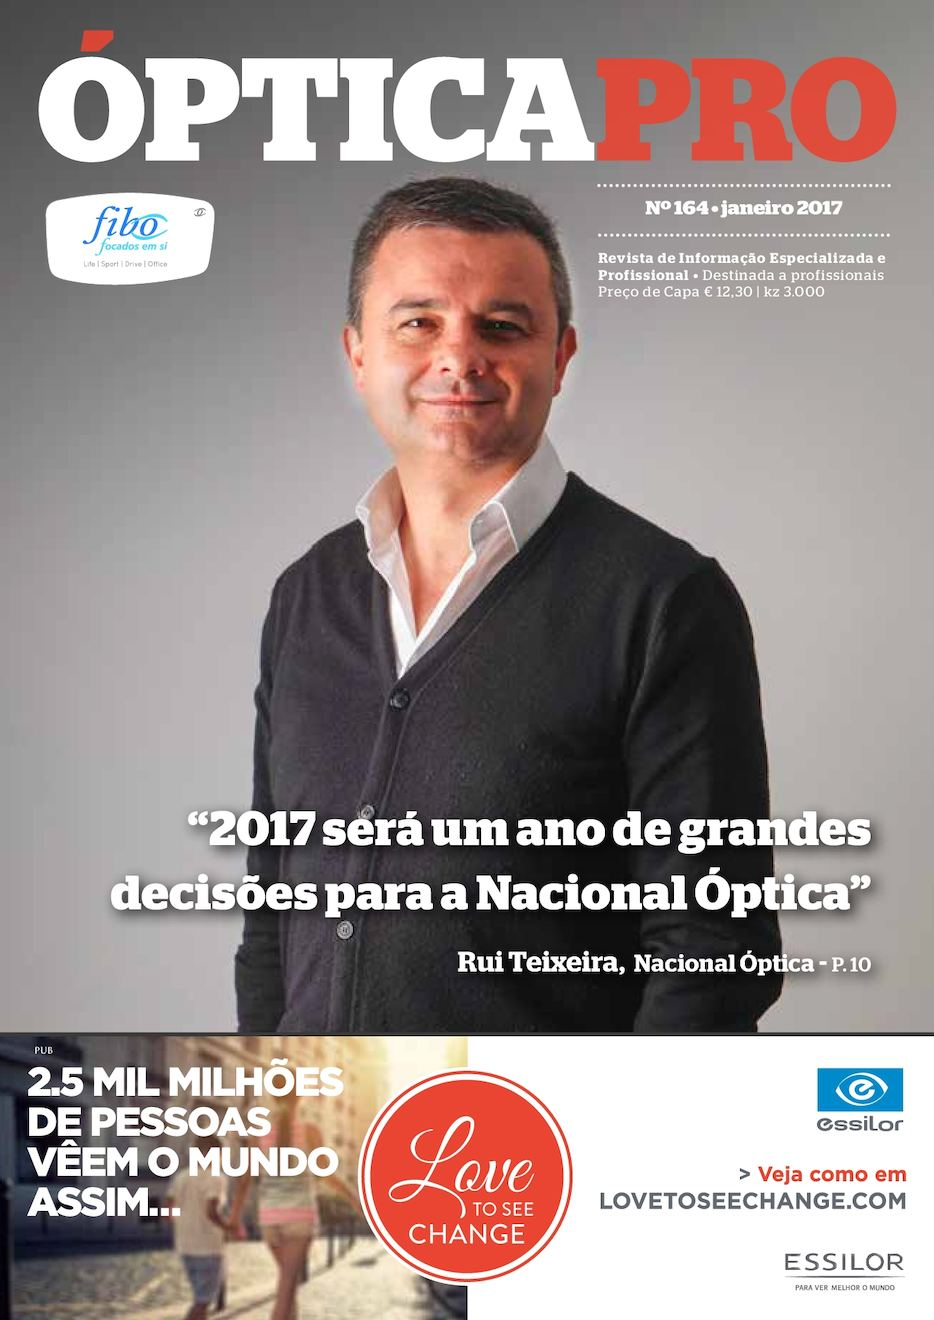 Calaméo - Opticapro 164 0504a9e245